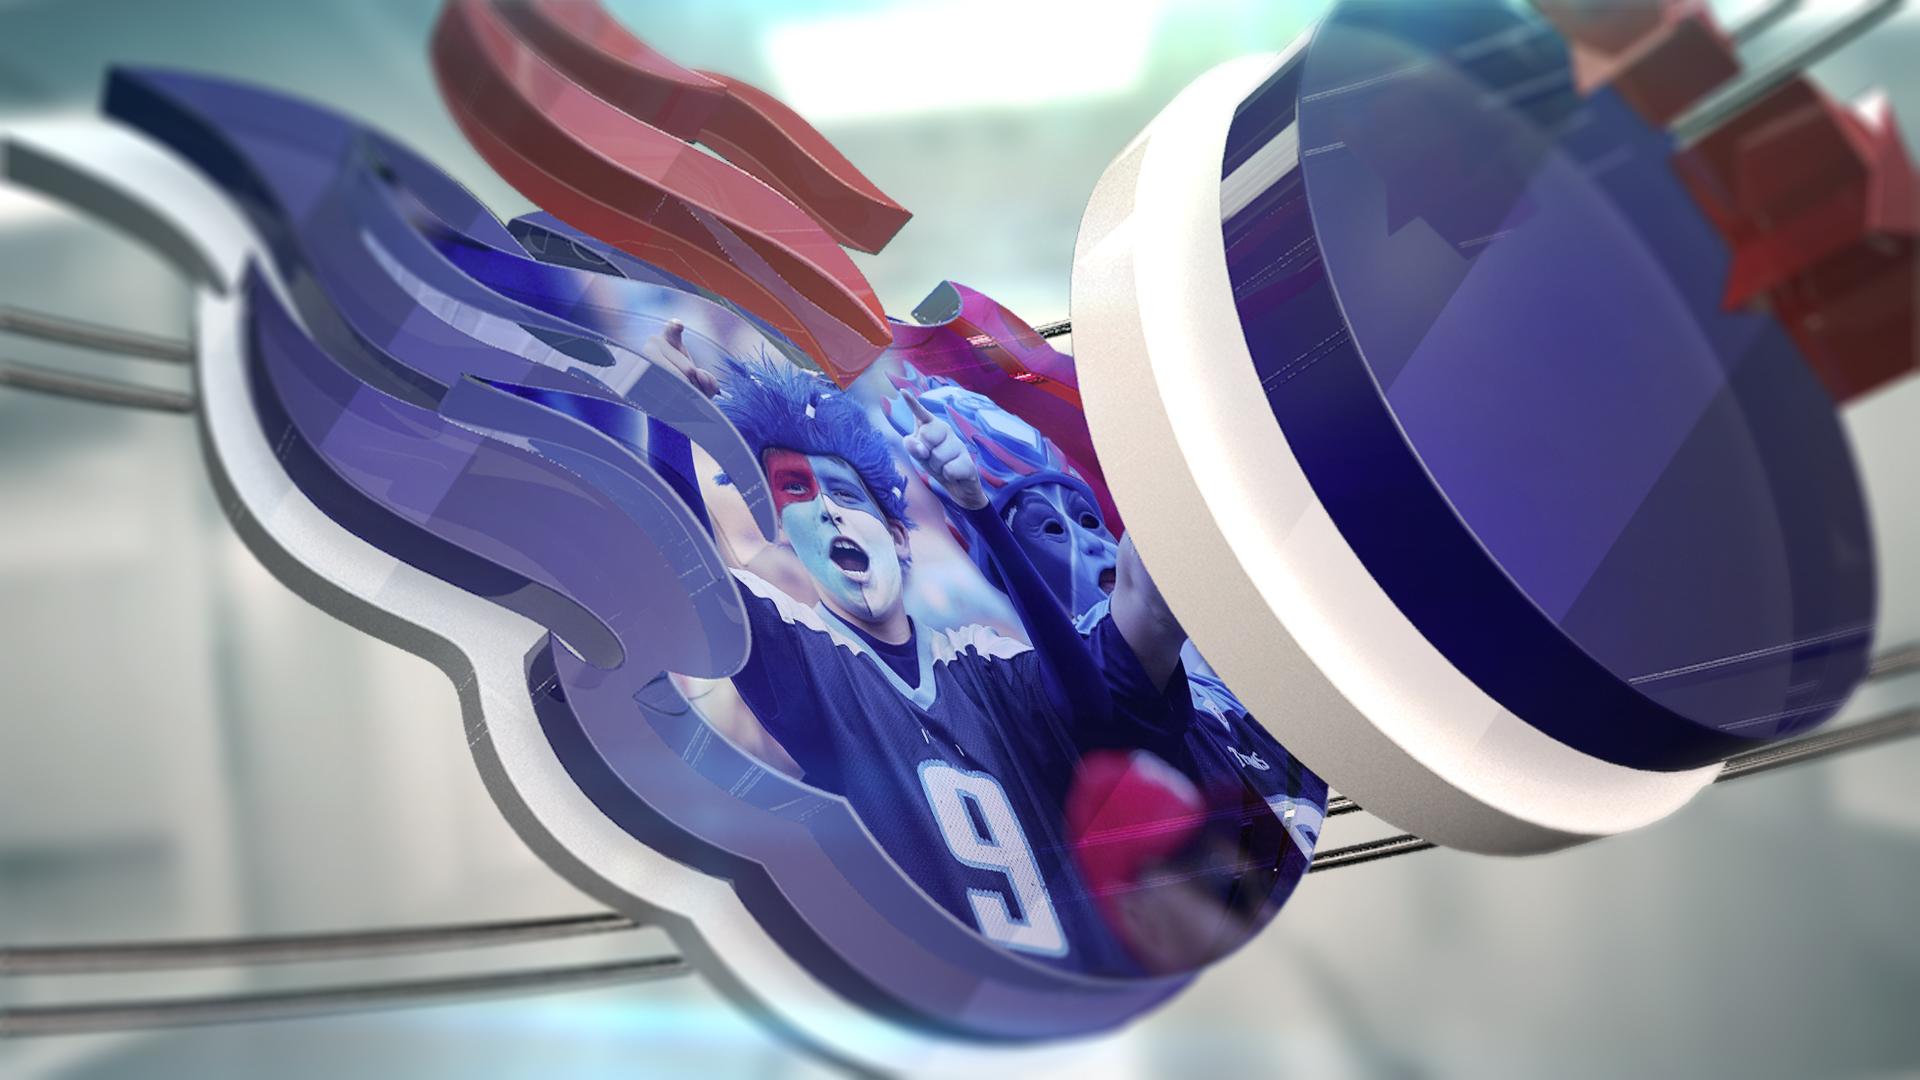 Titans_Concept_LookFrame_002.jpg